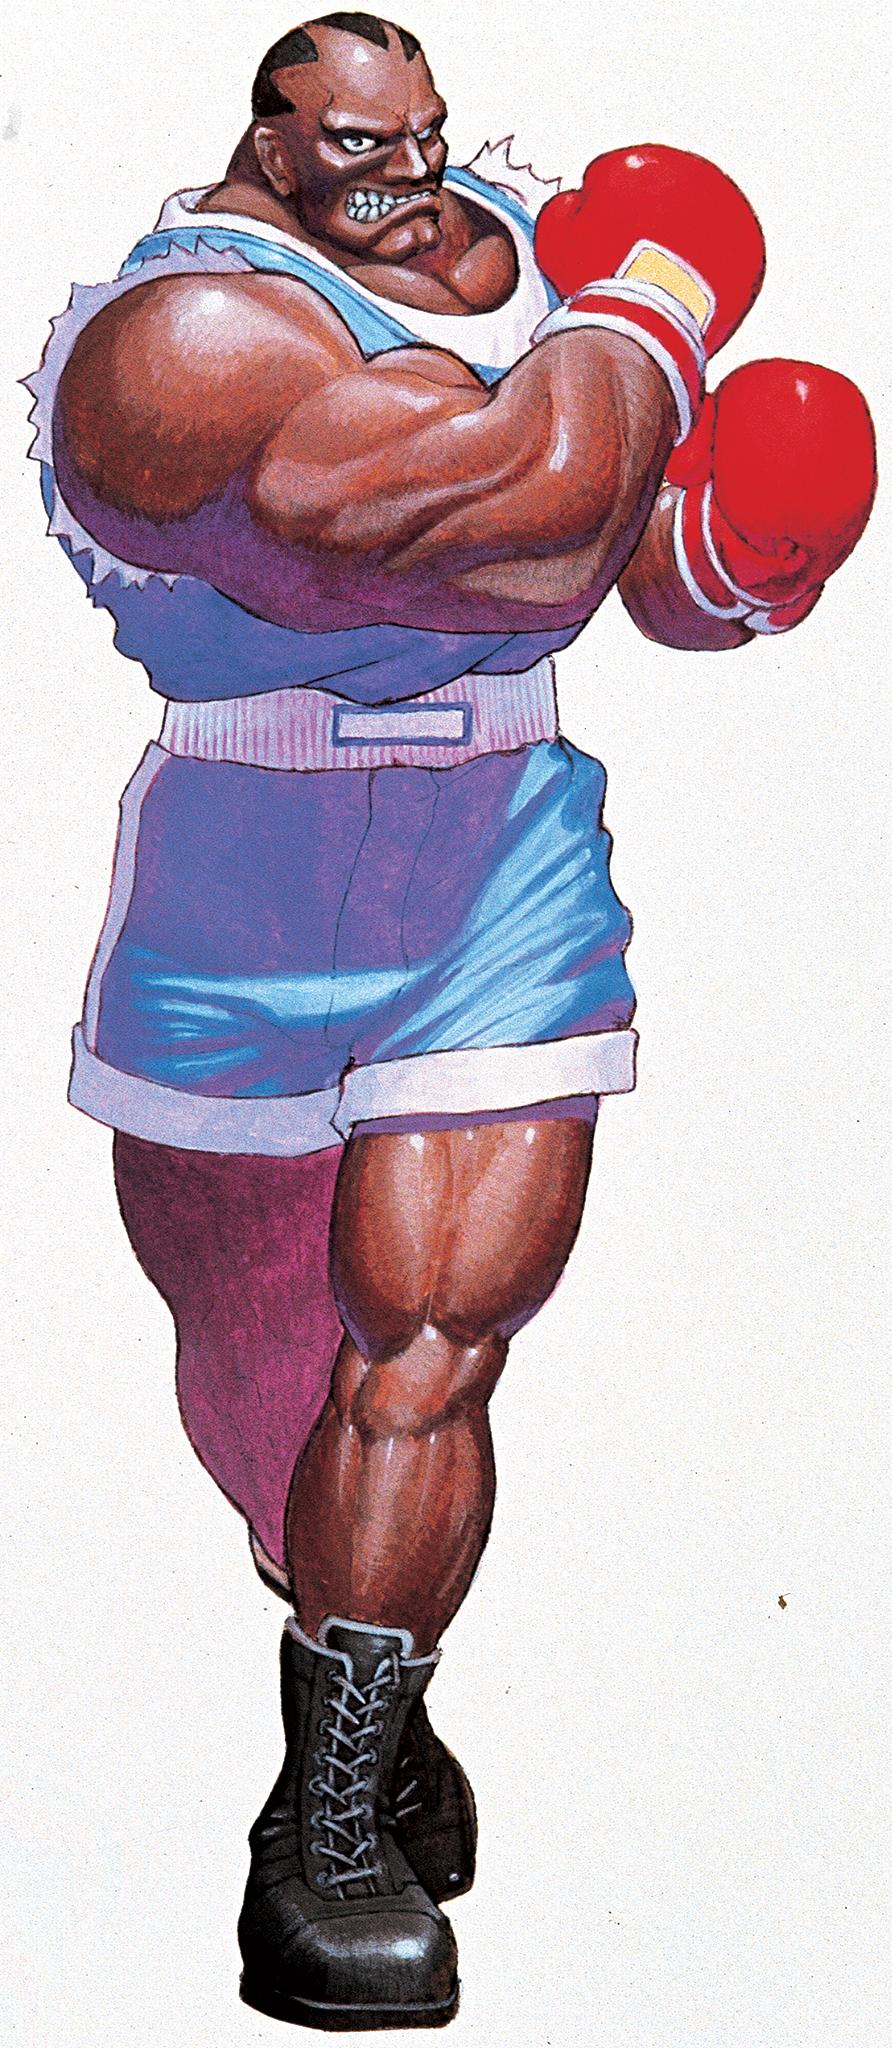 2b489a395 Balrog, as he appears in Super Street Fighter II. Art by Bengus.